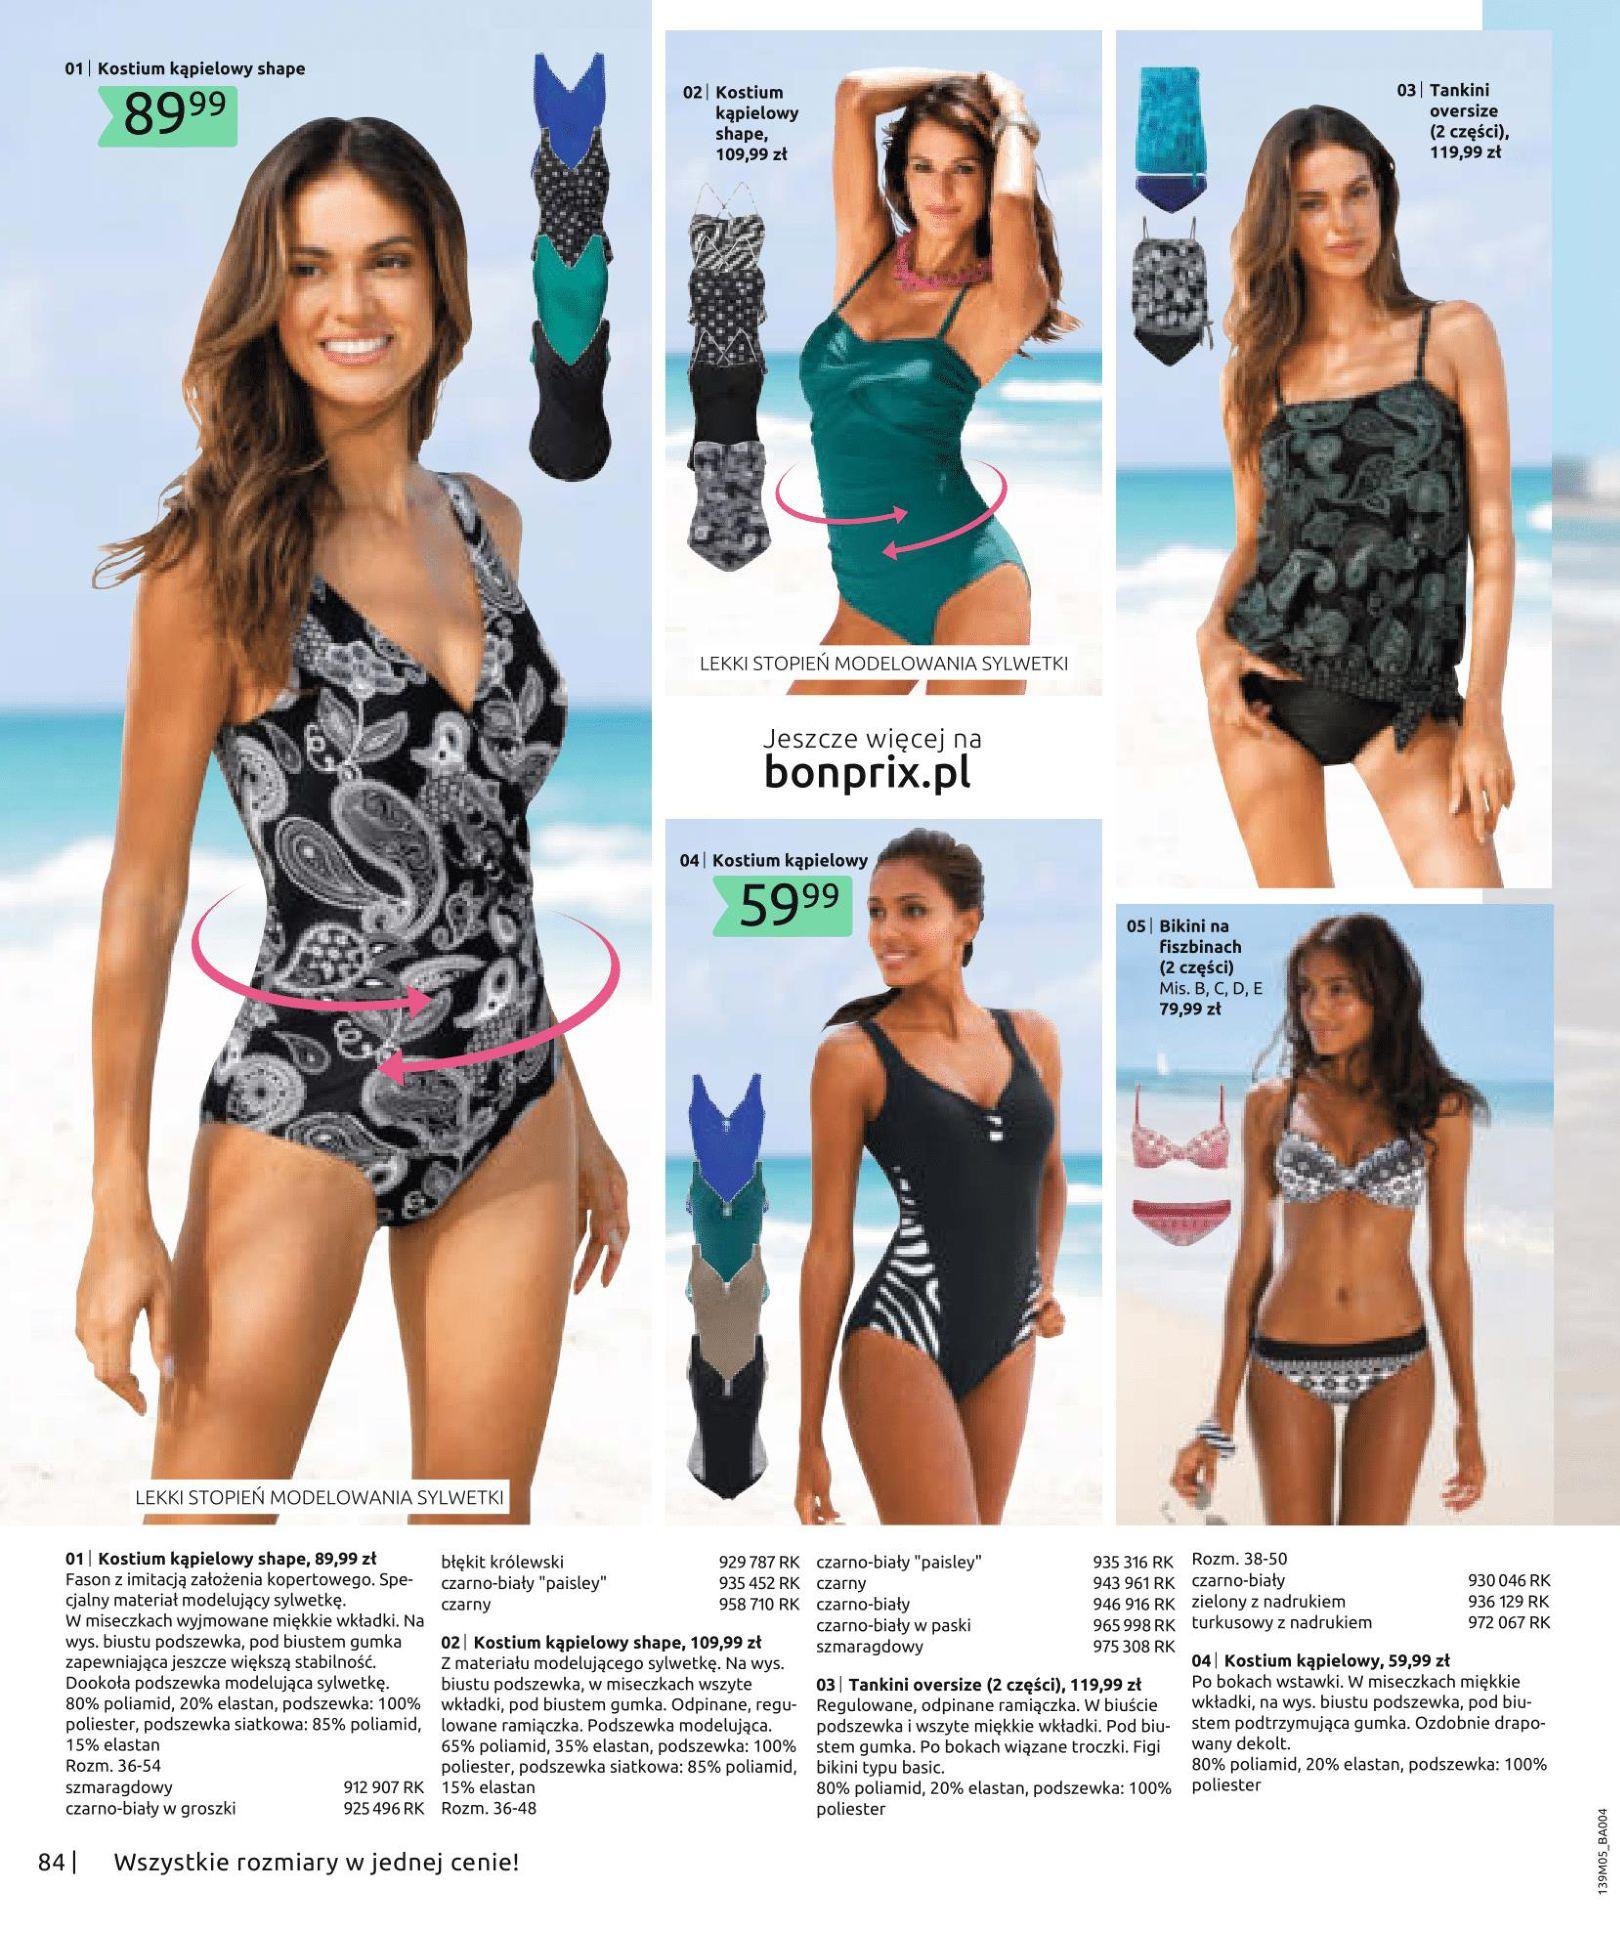 Gazetka Bonprix - Romantic Summer-02.07.2019-29.10.2019-page-86